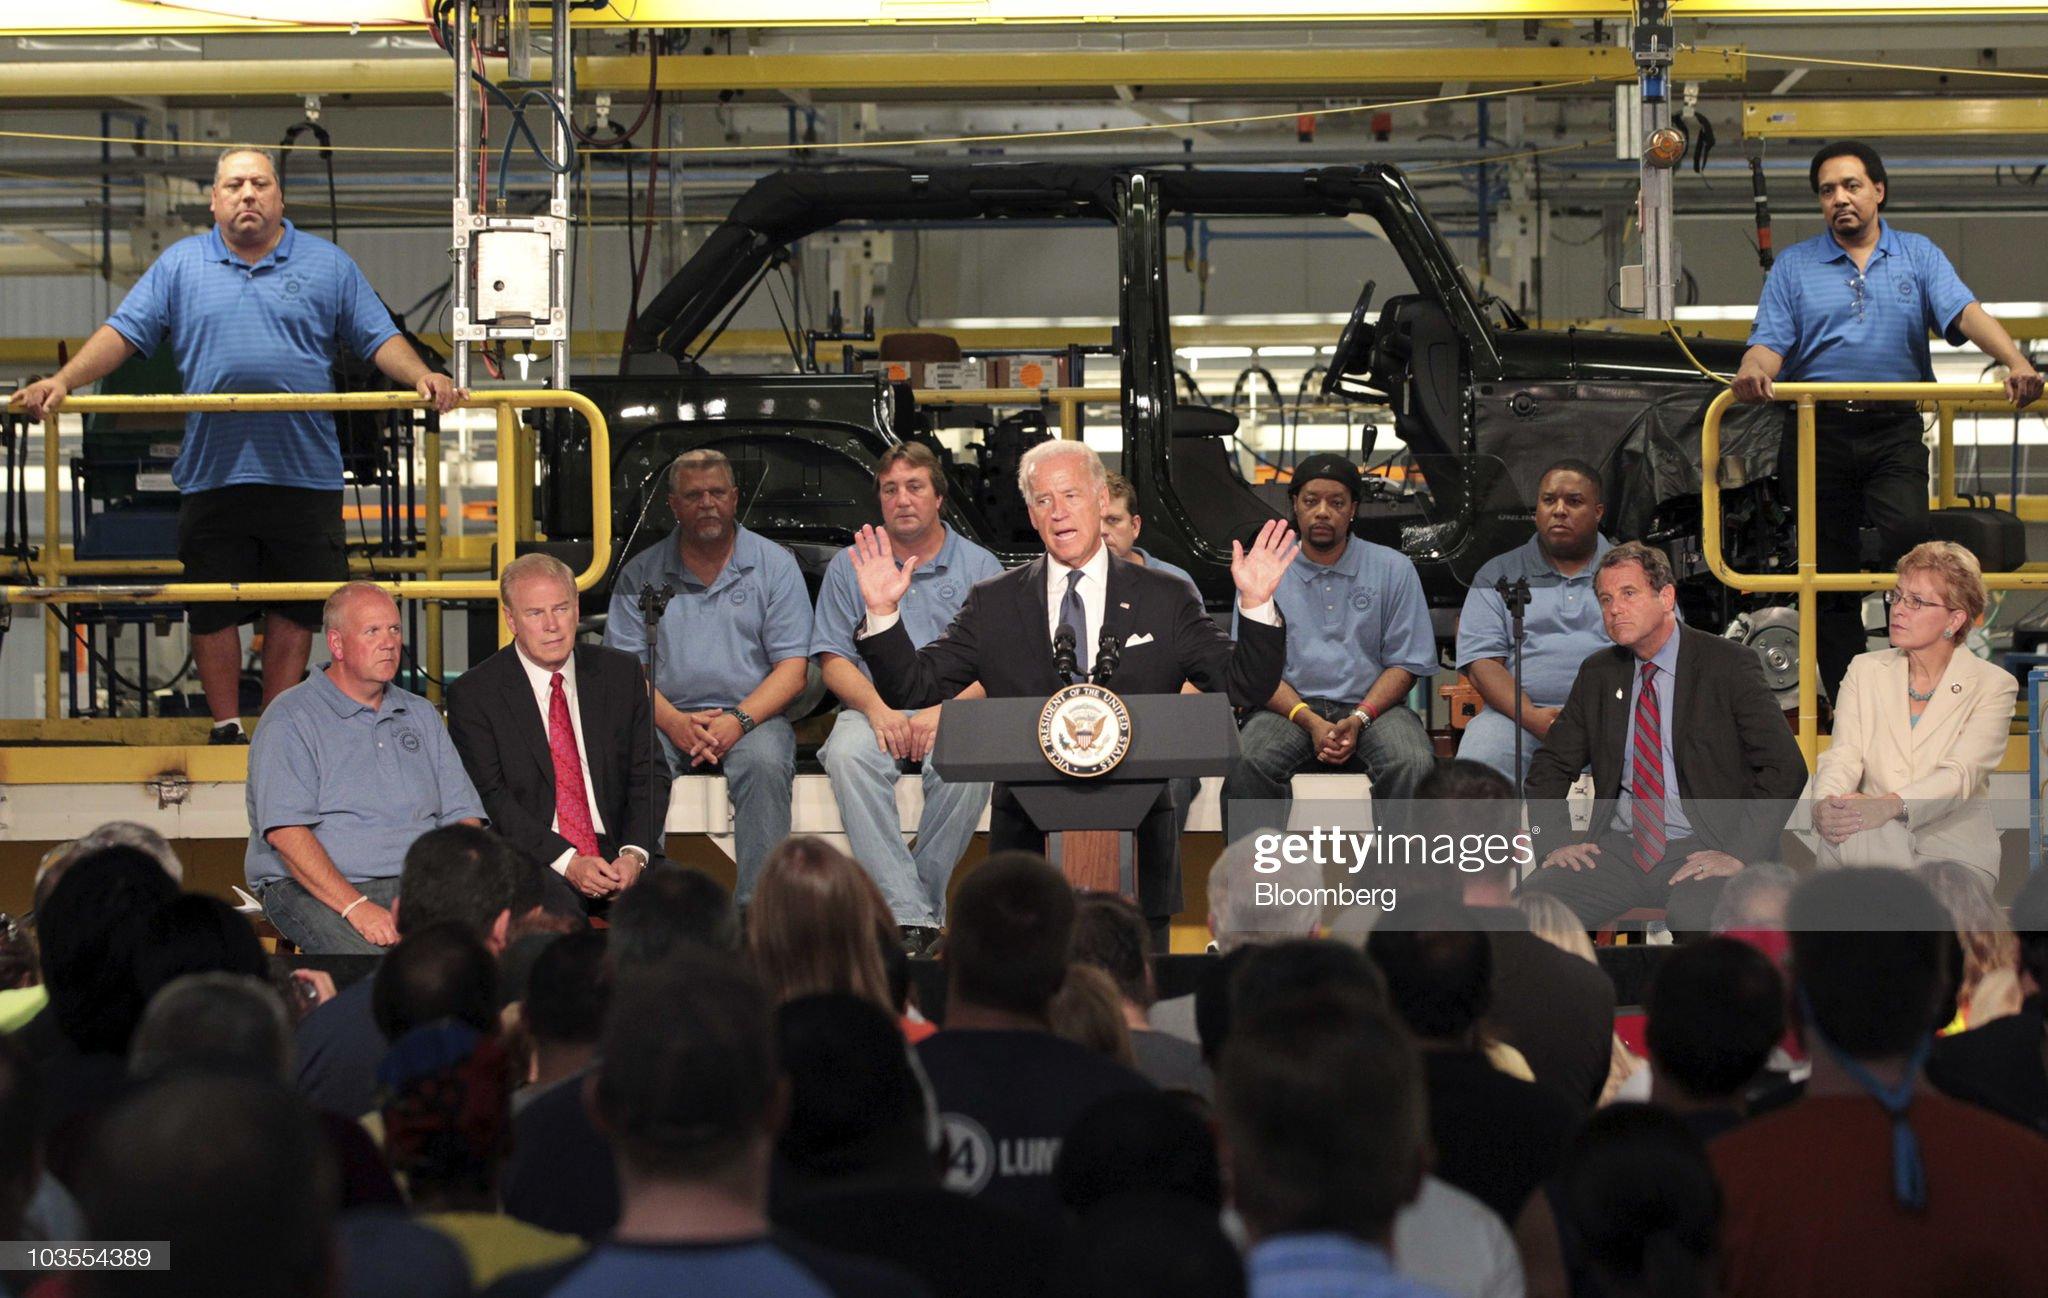 Vice President Biden Tours Chrysler Toledo Manufacturing Facility : News Photo